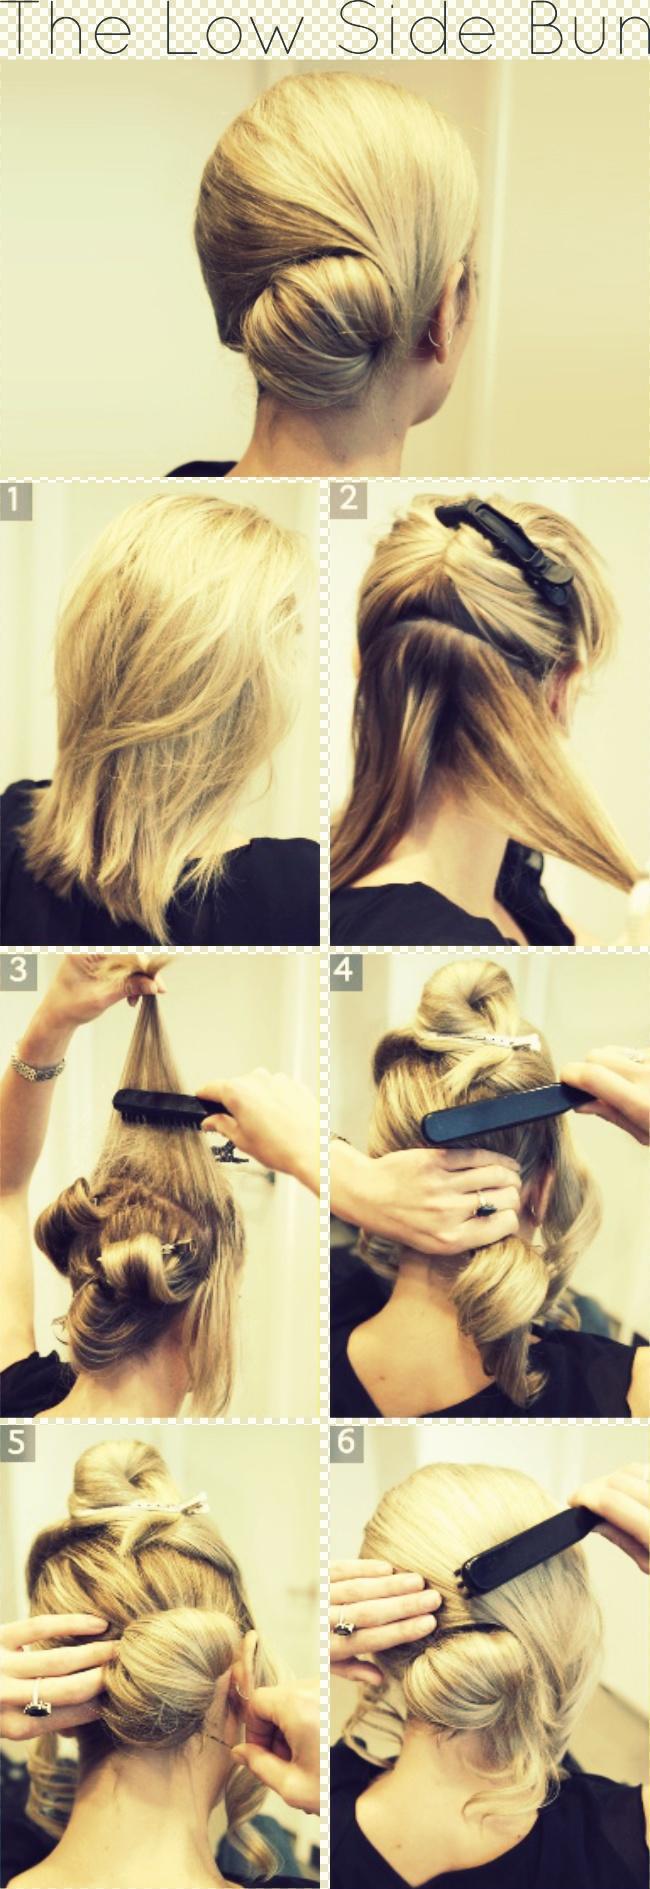 Fabulous Graceful And Beautiful Low Side Bun Hairstyle Tutorials And Hair Short Hairstyles Gunalazisus